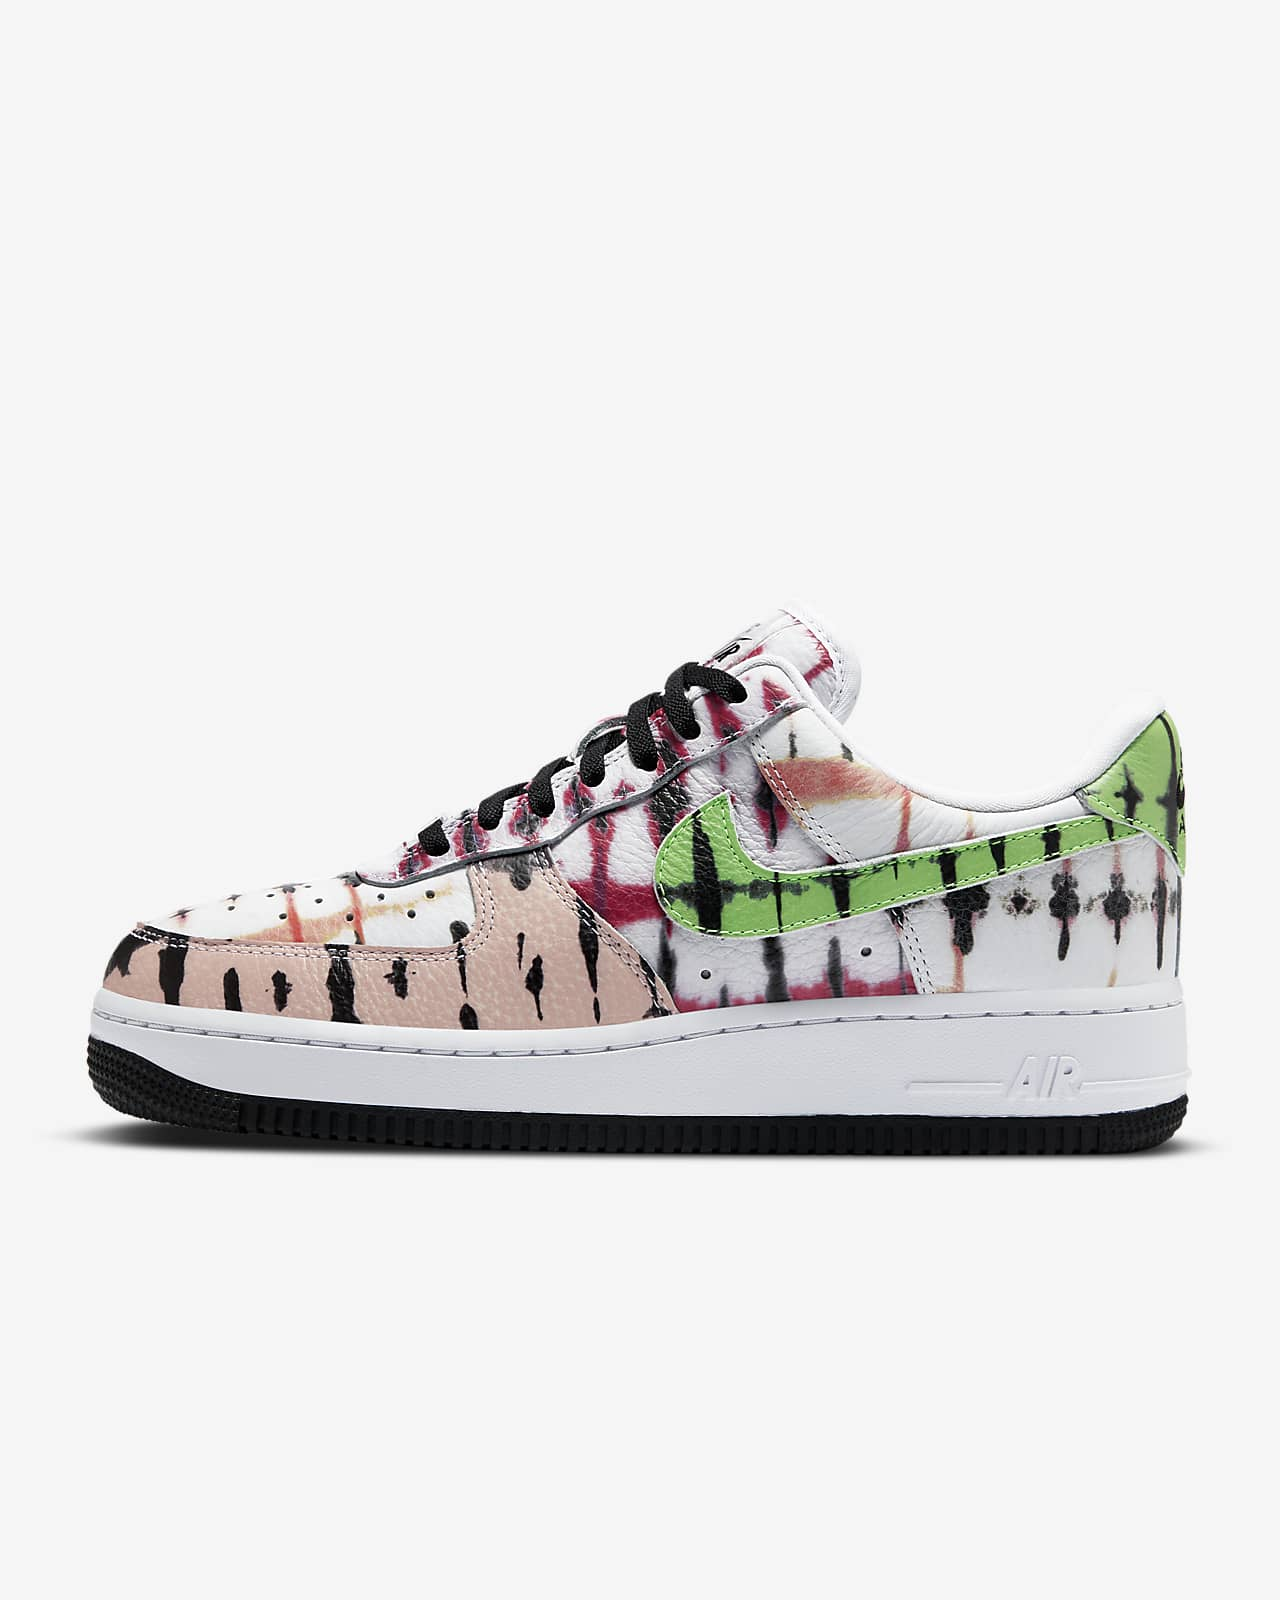 Nike Air Force 1 '07 QS 女子运动鞋